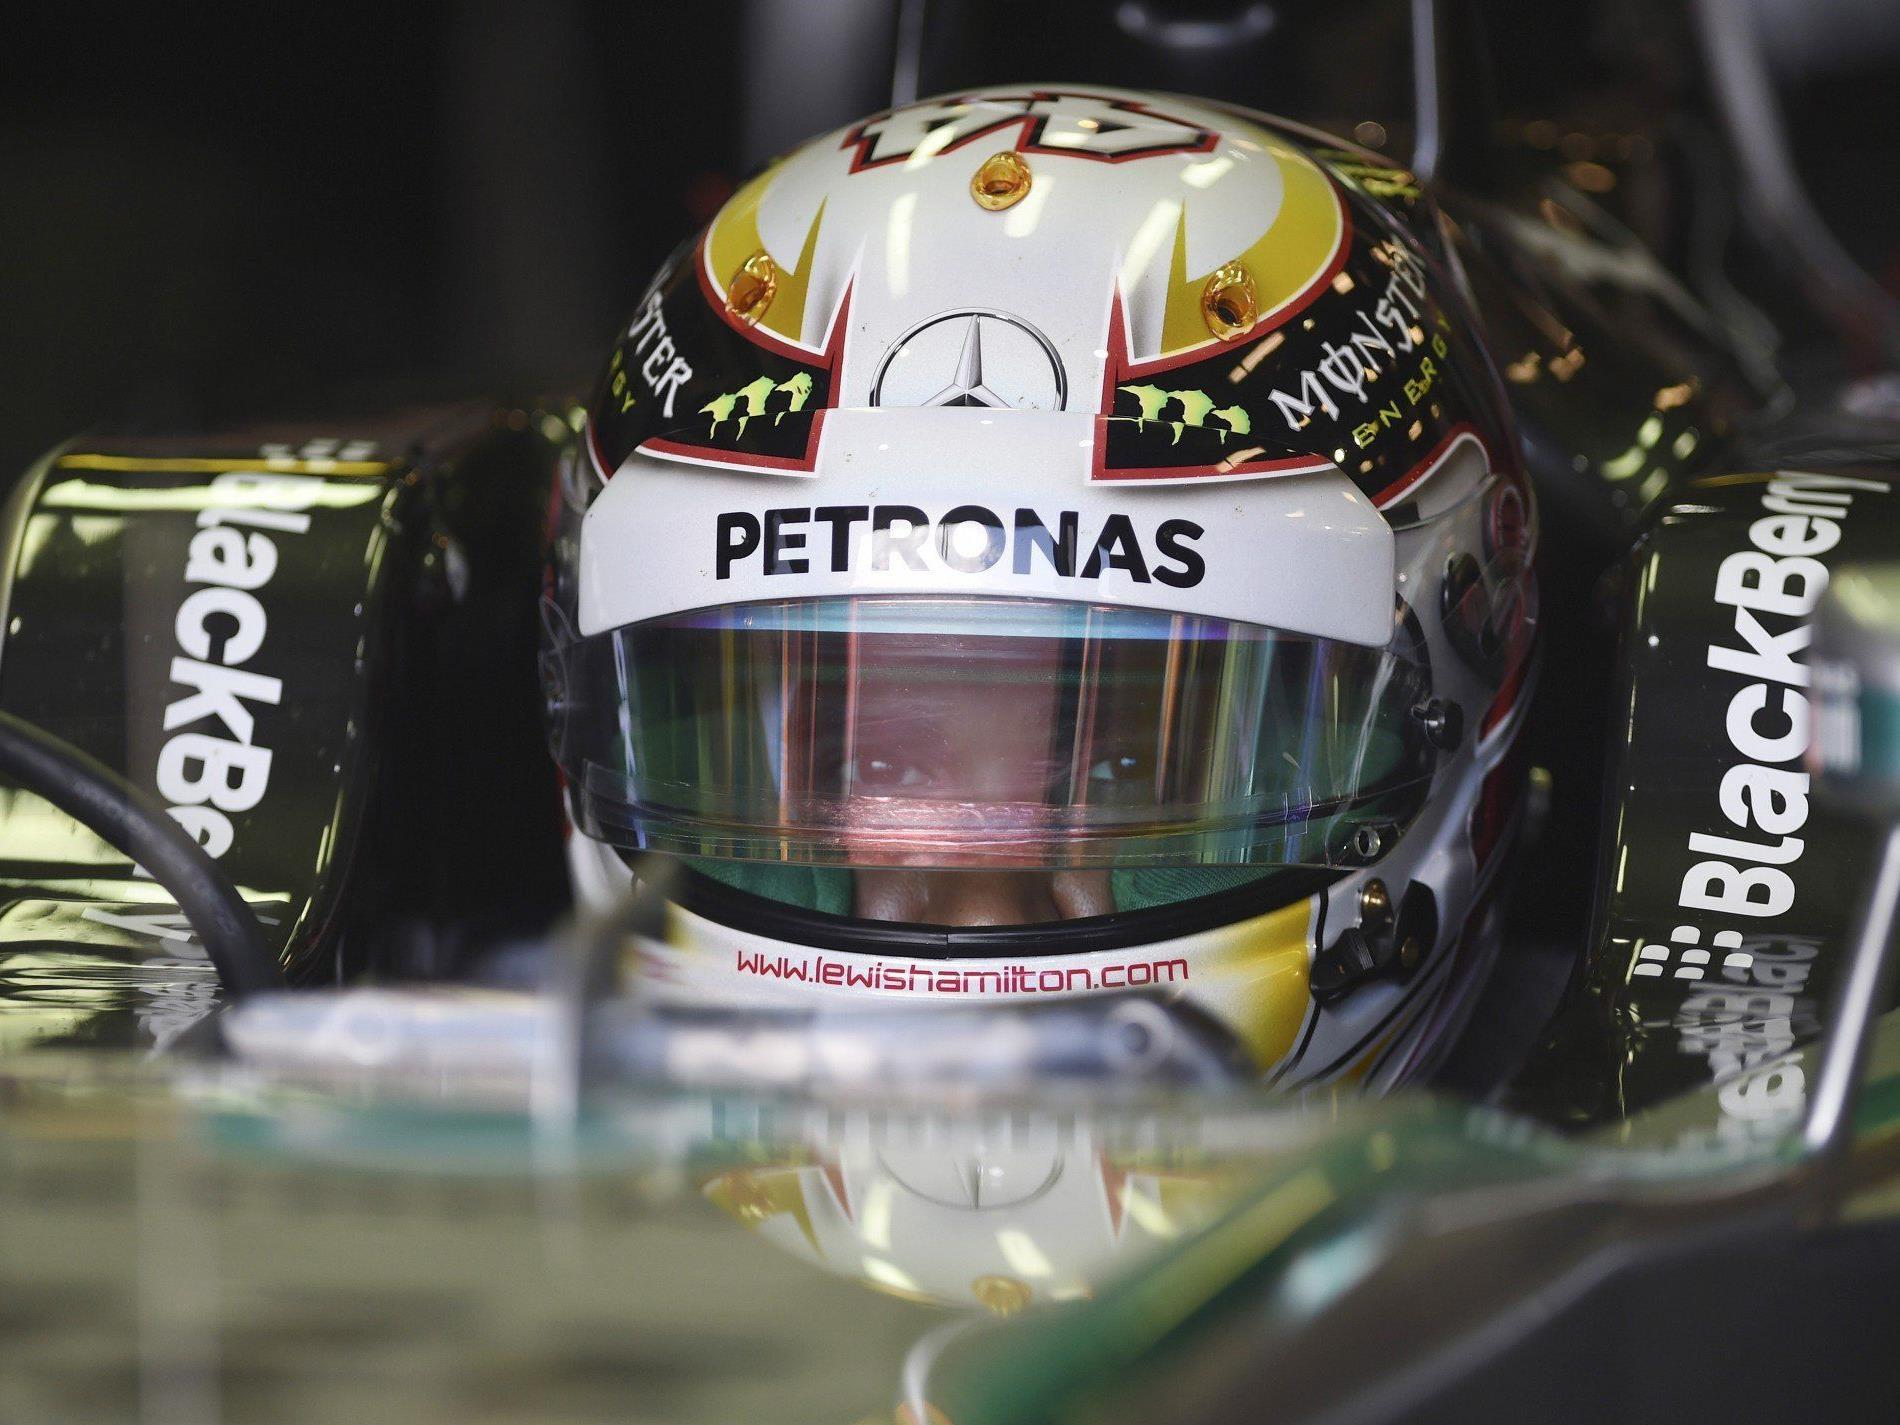 Mercedes im ersten Saisonrennen klarer Favorit.